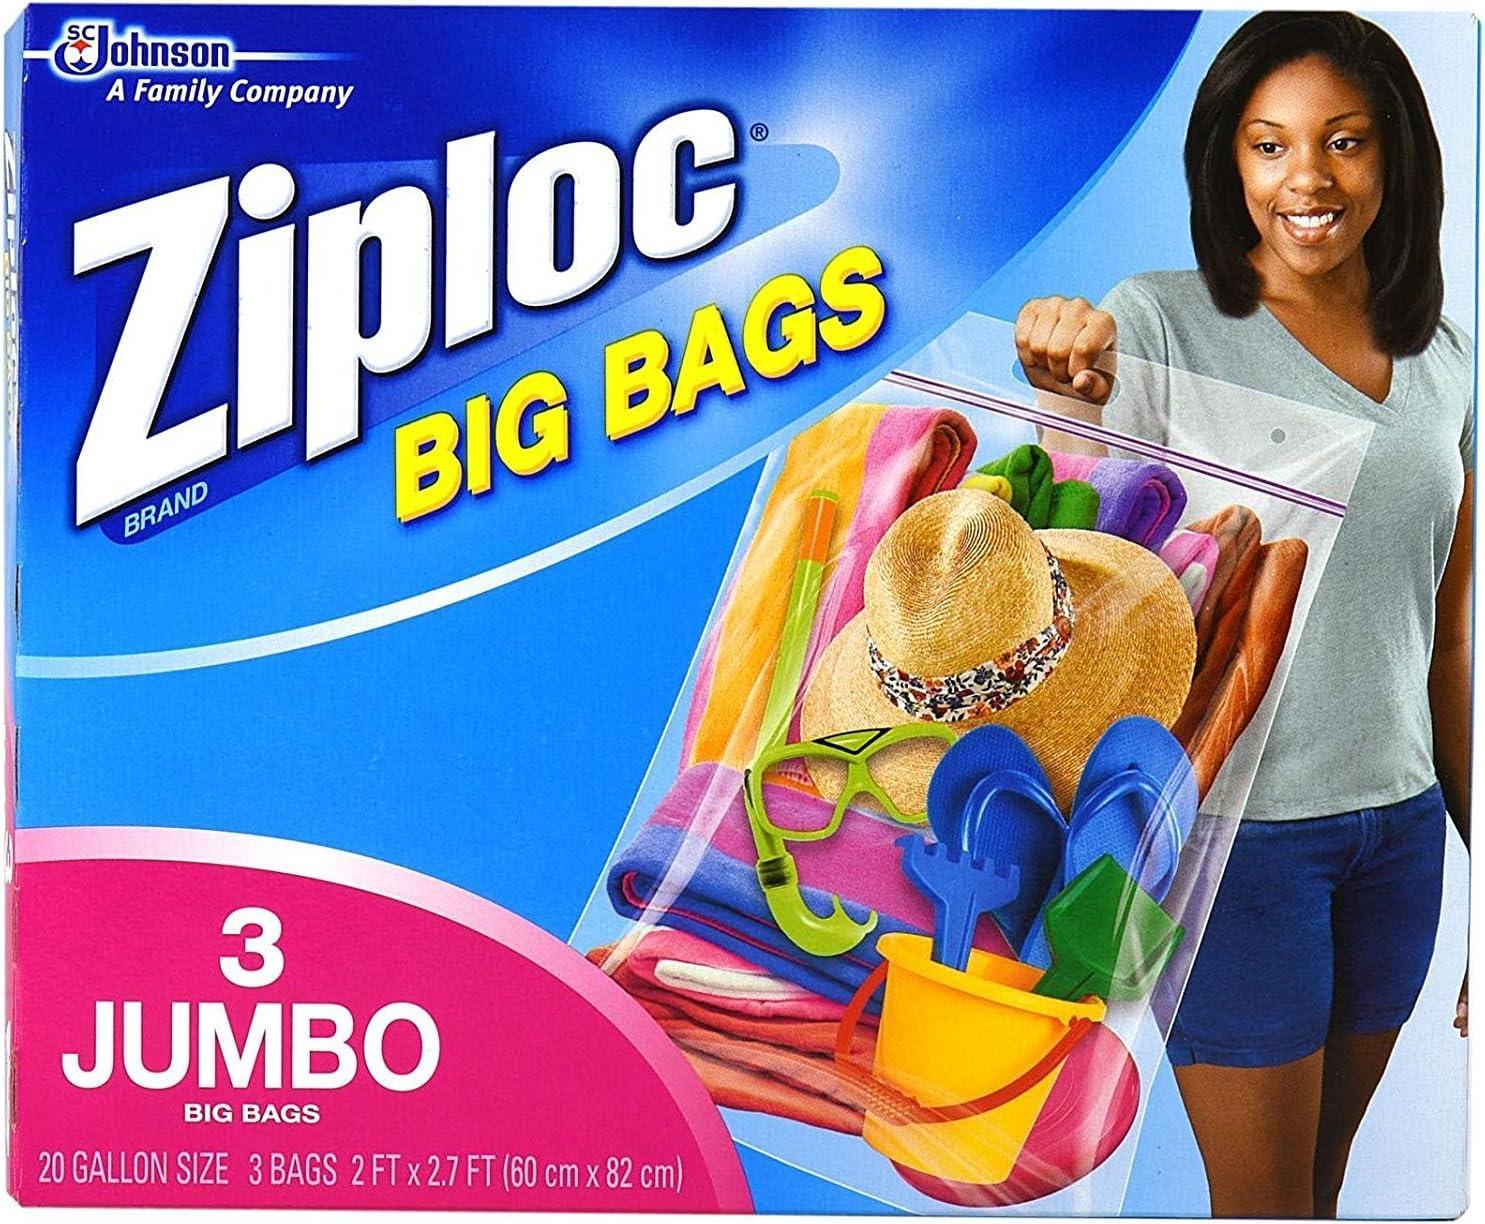 Ziploc Big Bags, XXL Double Zipper Bag - 3 ct - 2 pk